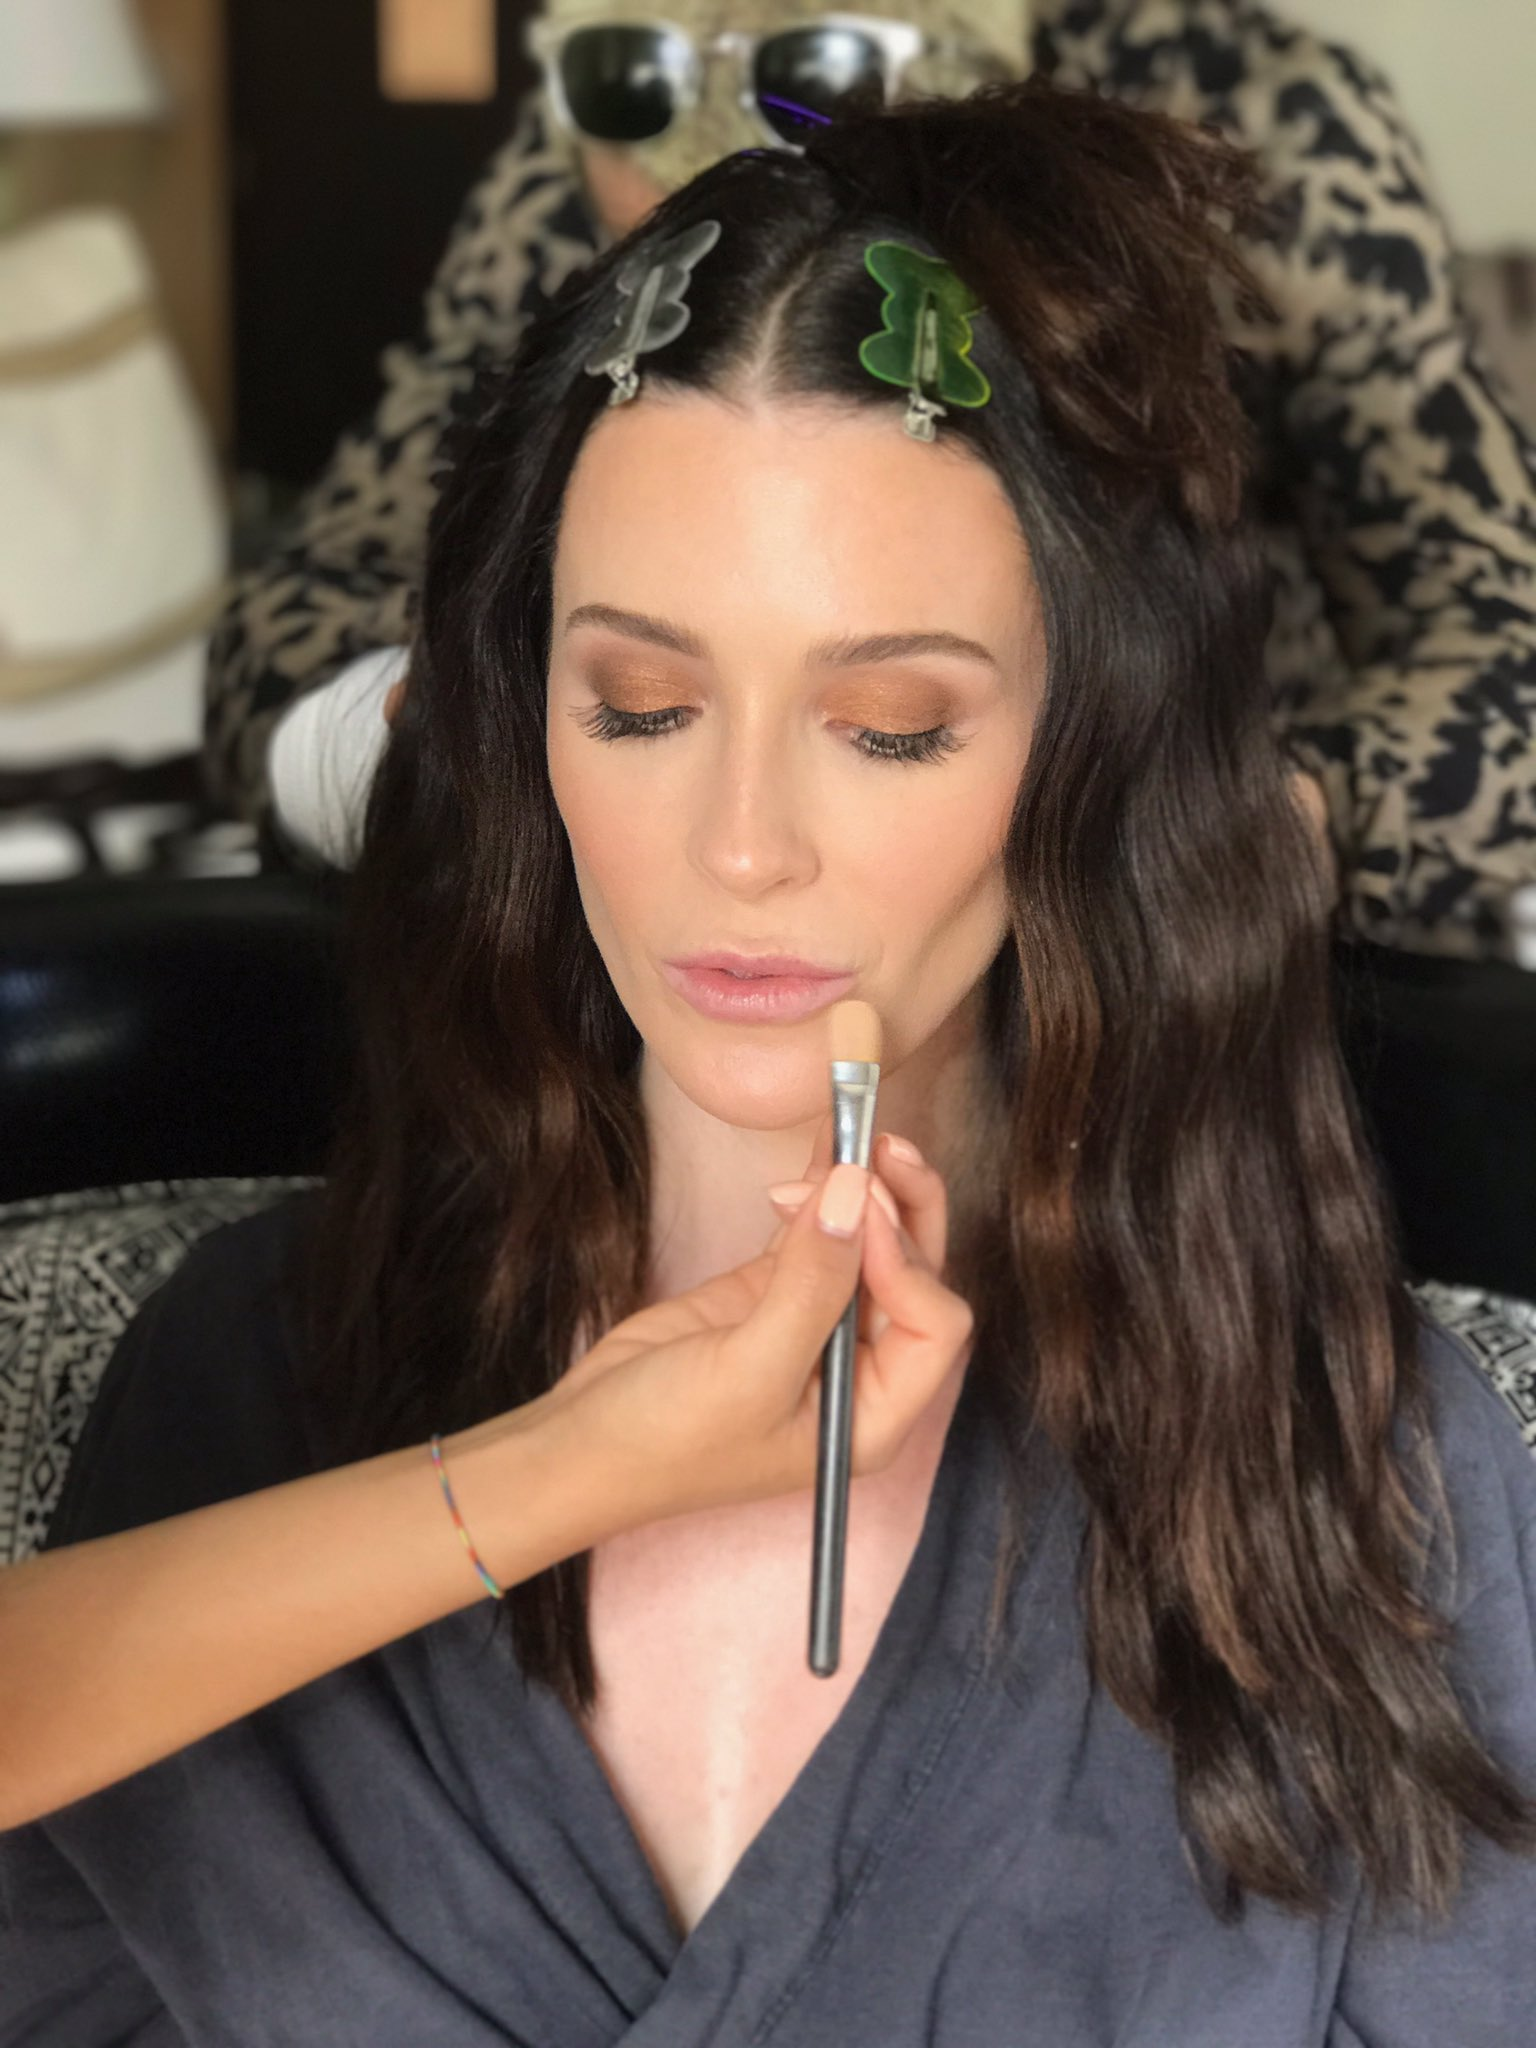 bridget regan makeup